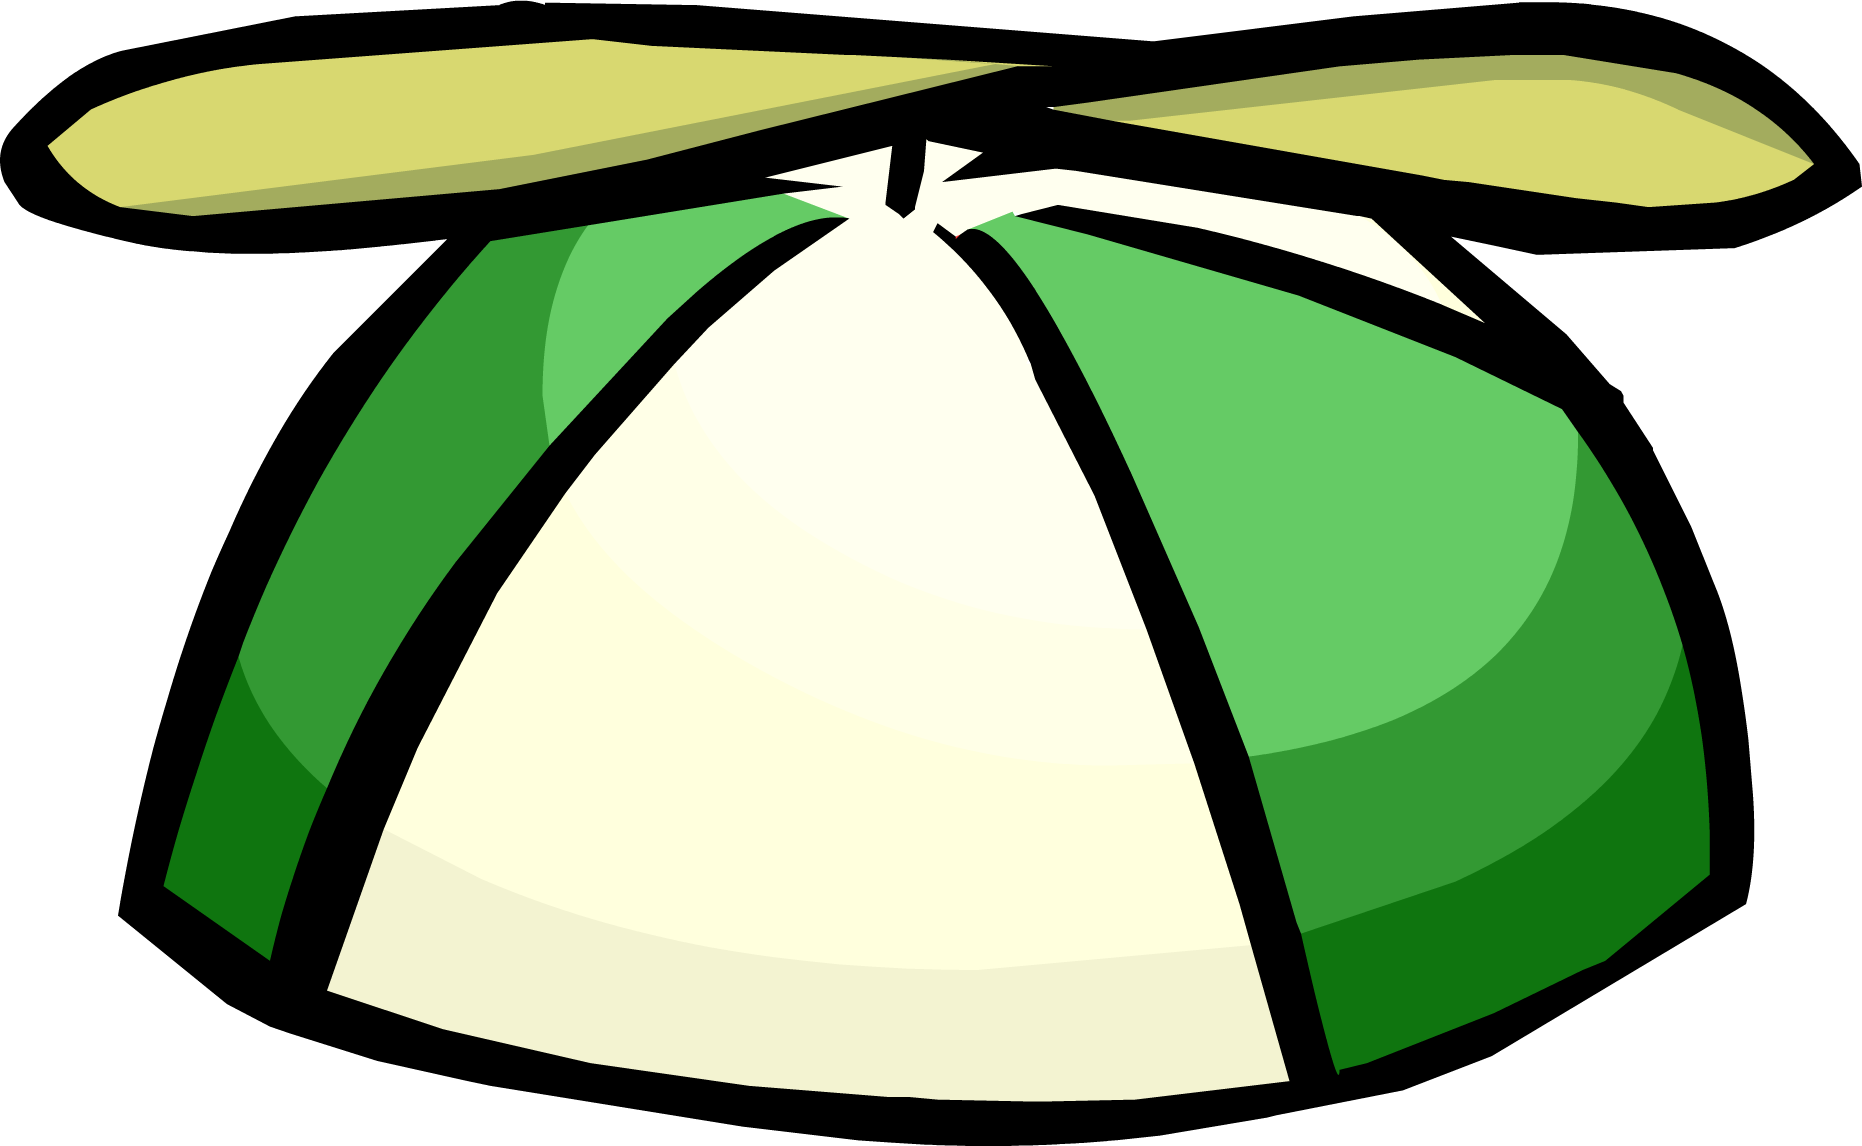 Green Propeller Cap